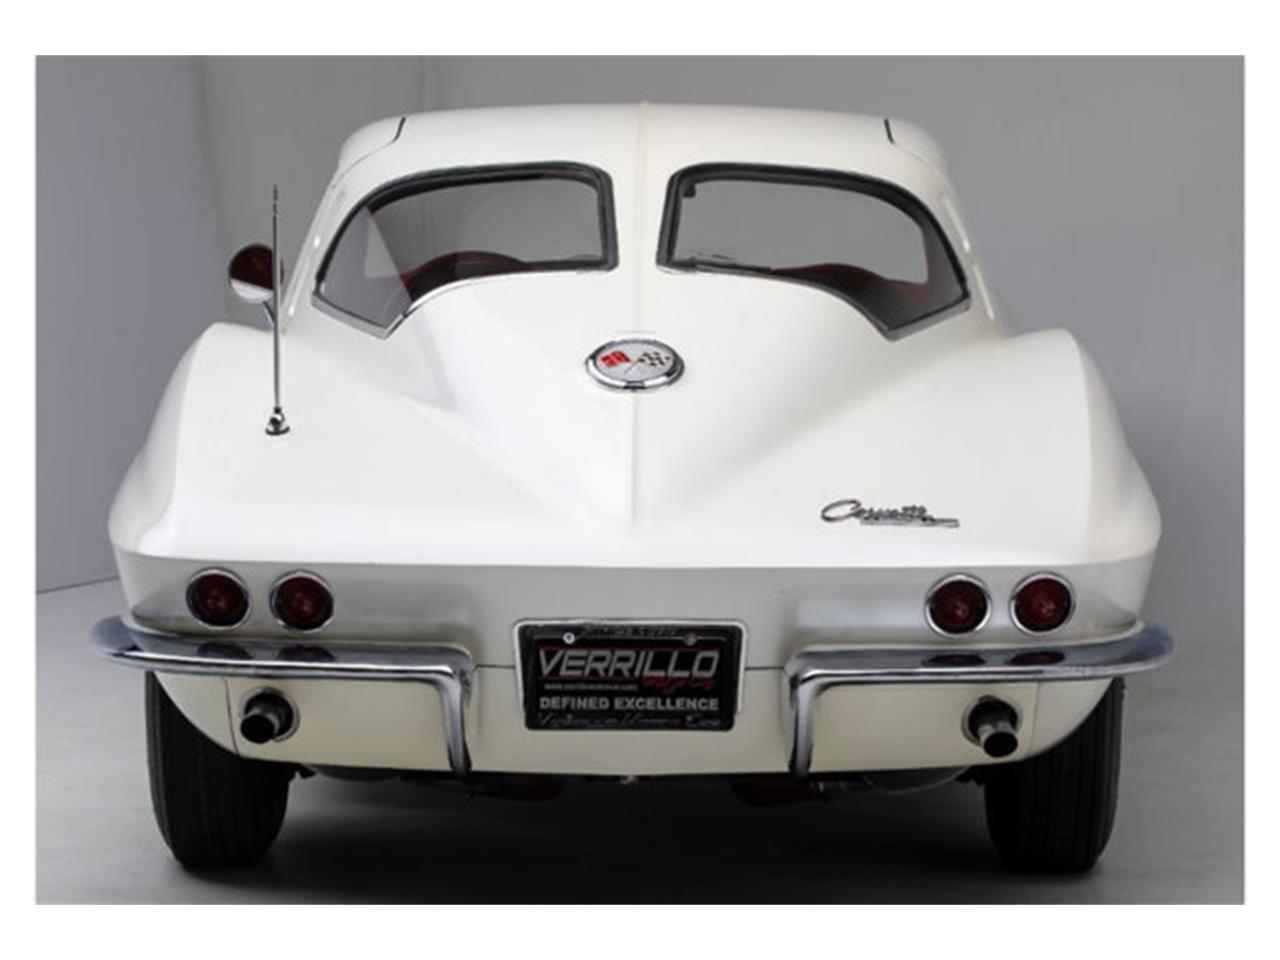 Large Picture of Classic '63 Chevrolet Corvette located in New York - $139,999.00 - QOXV